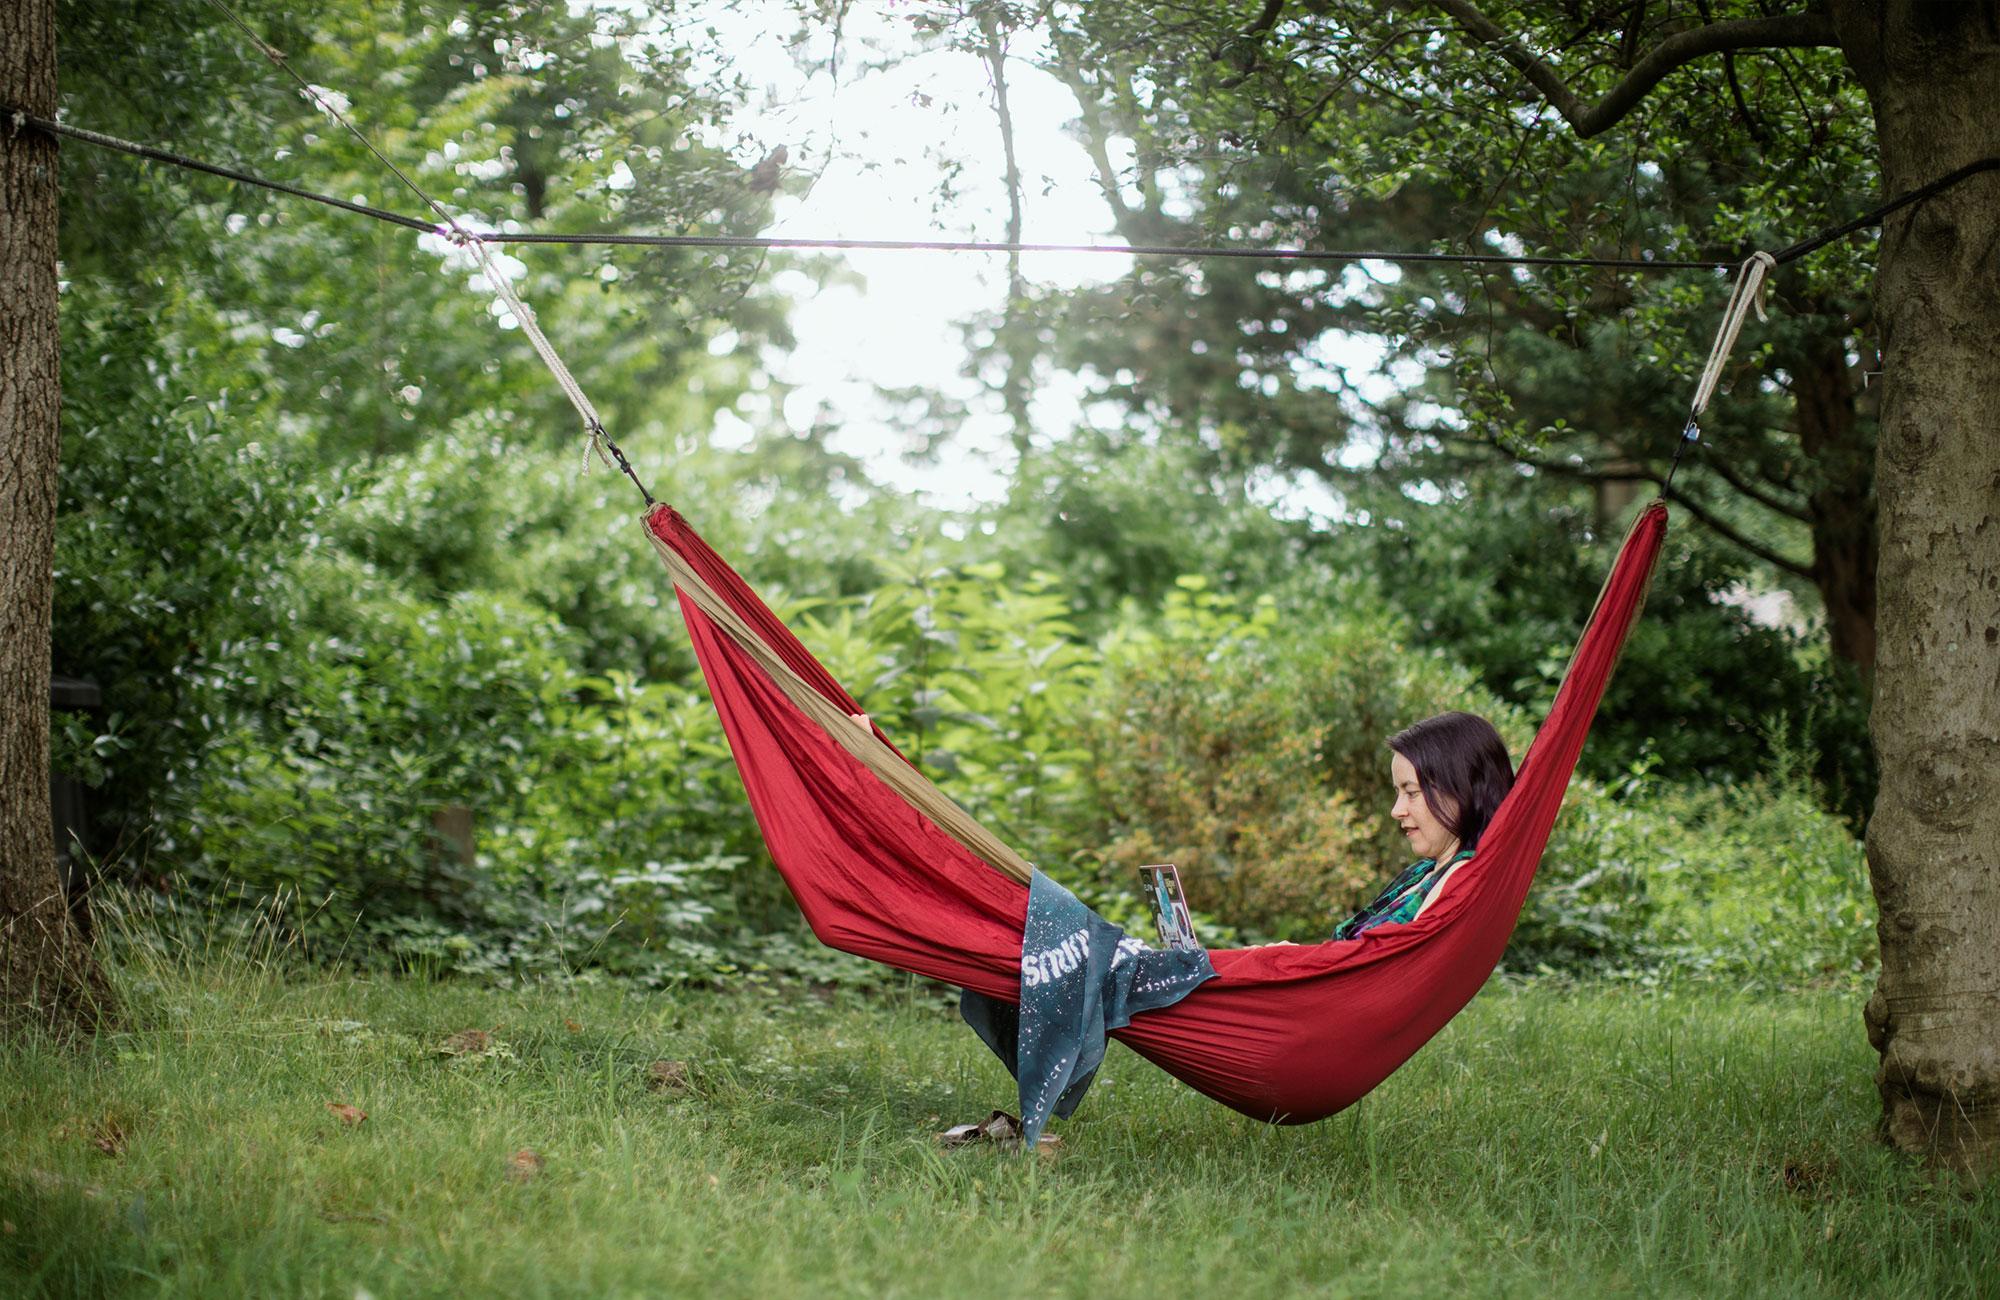 LizMacdonald in a hammock.